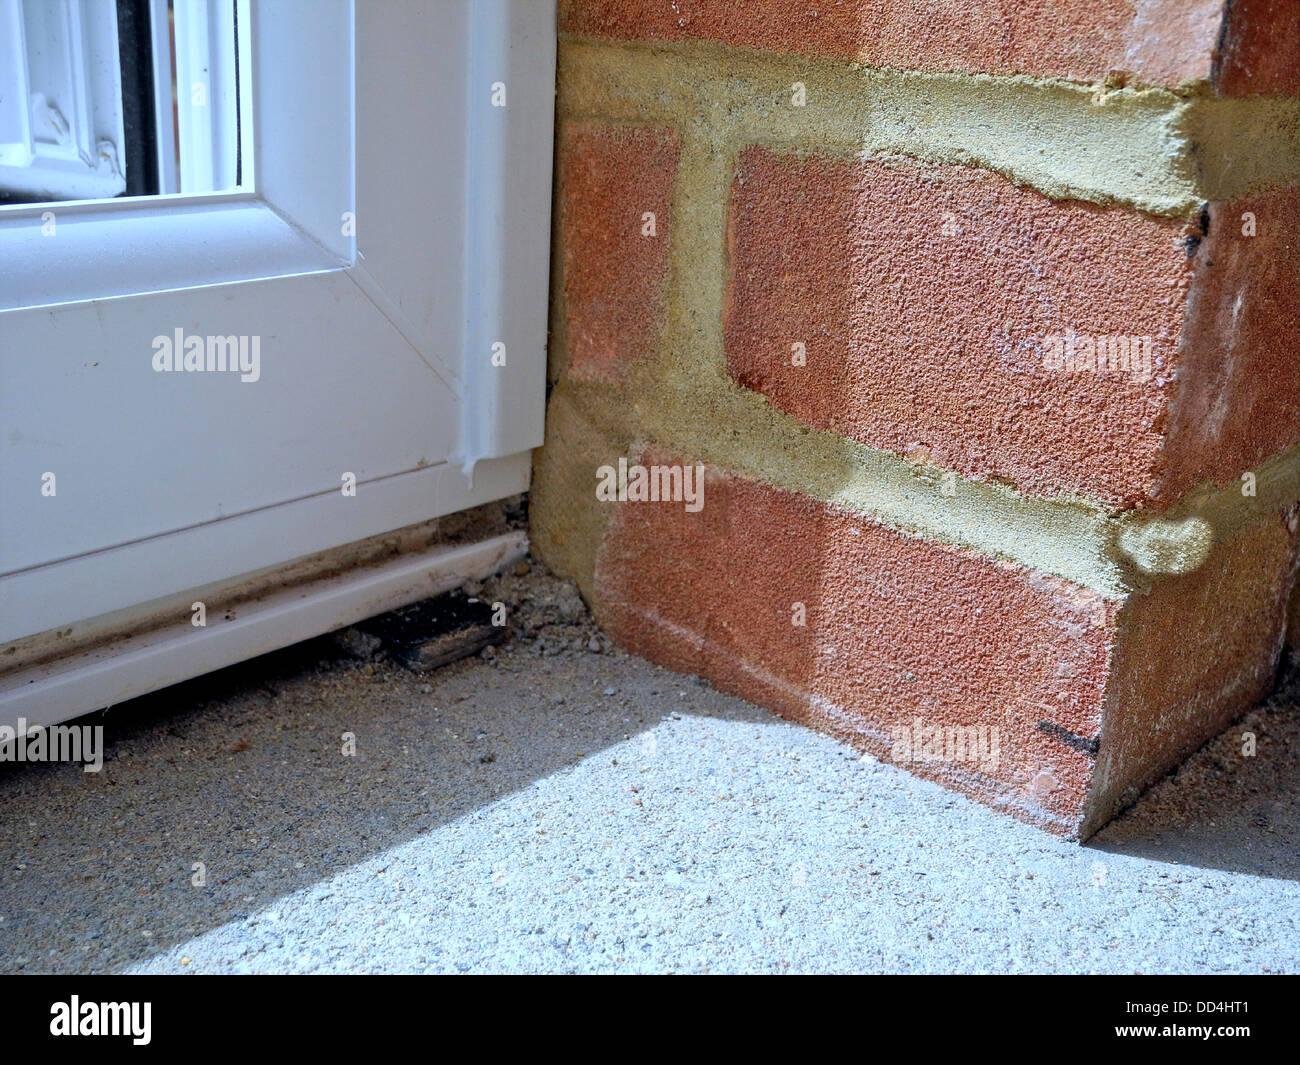 Bad brickwork badly laid bricks - Stock Image